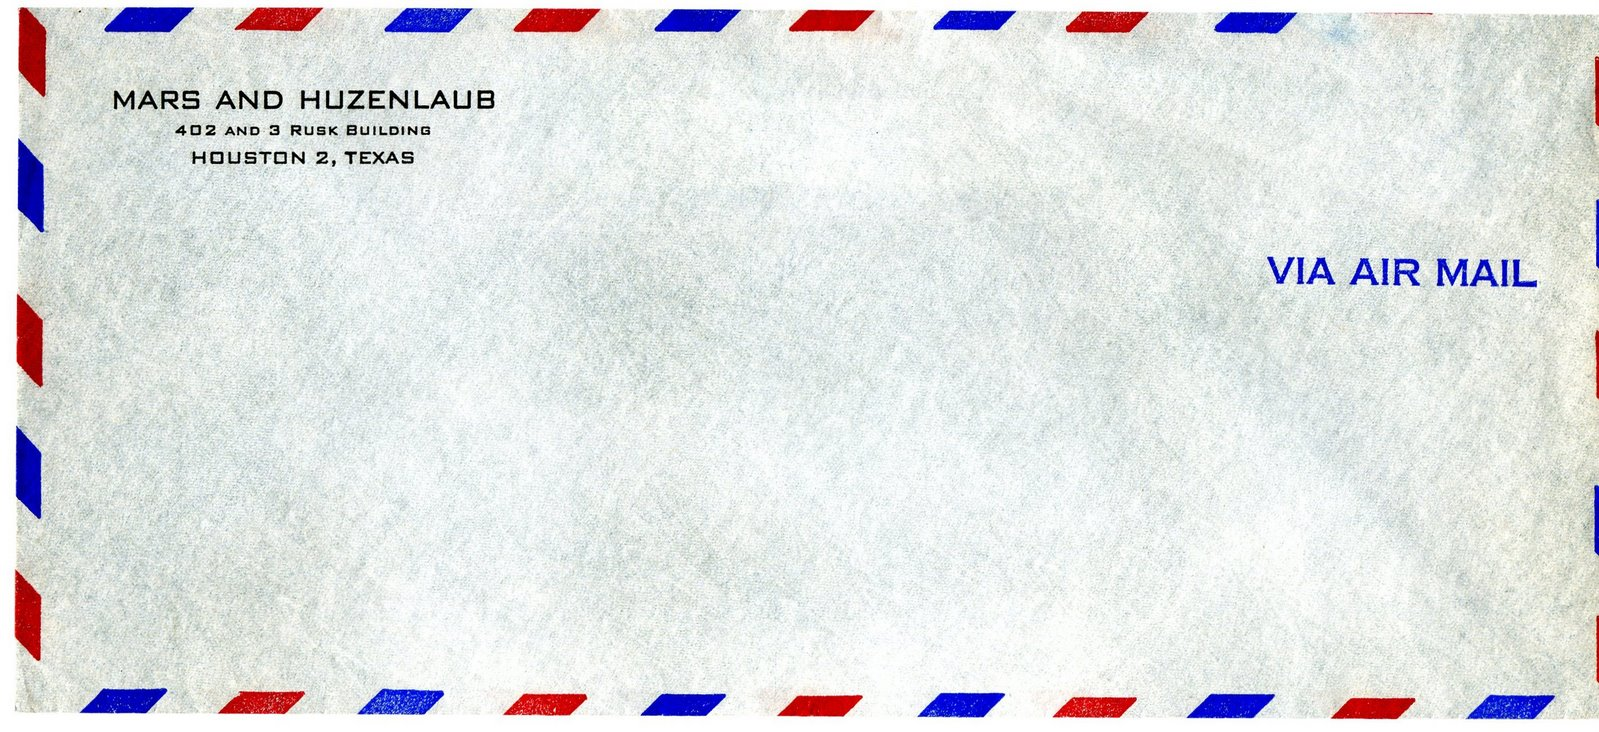 [Mars+and+Huzenlaub+Envelope.jpg]